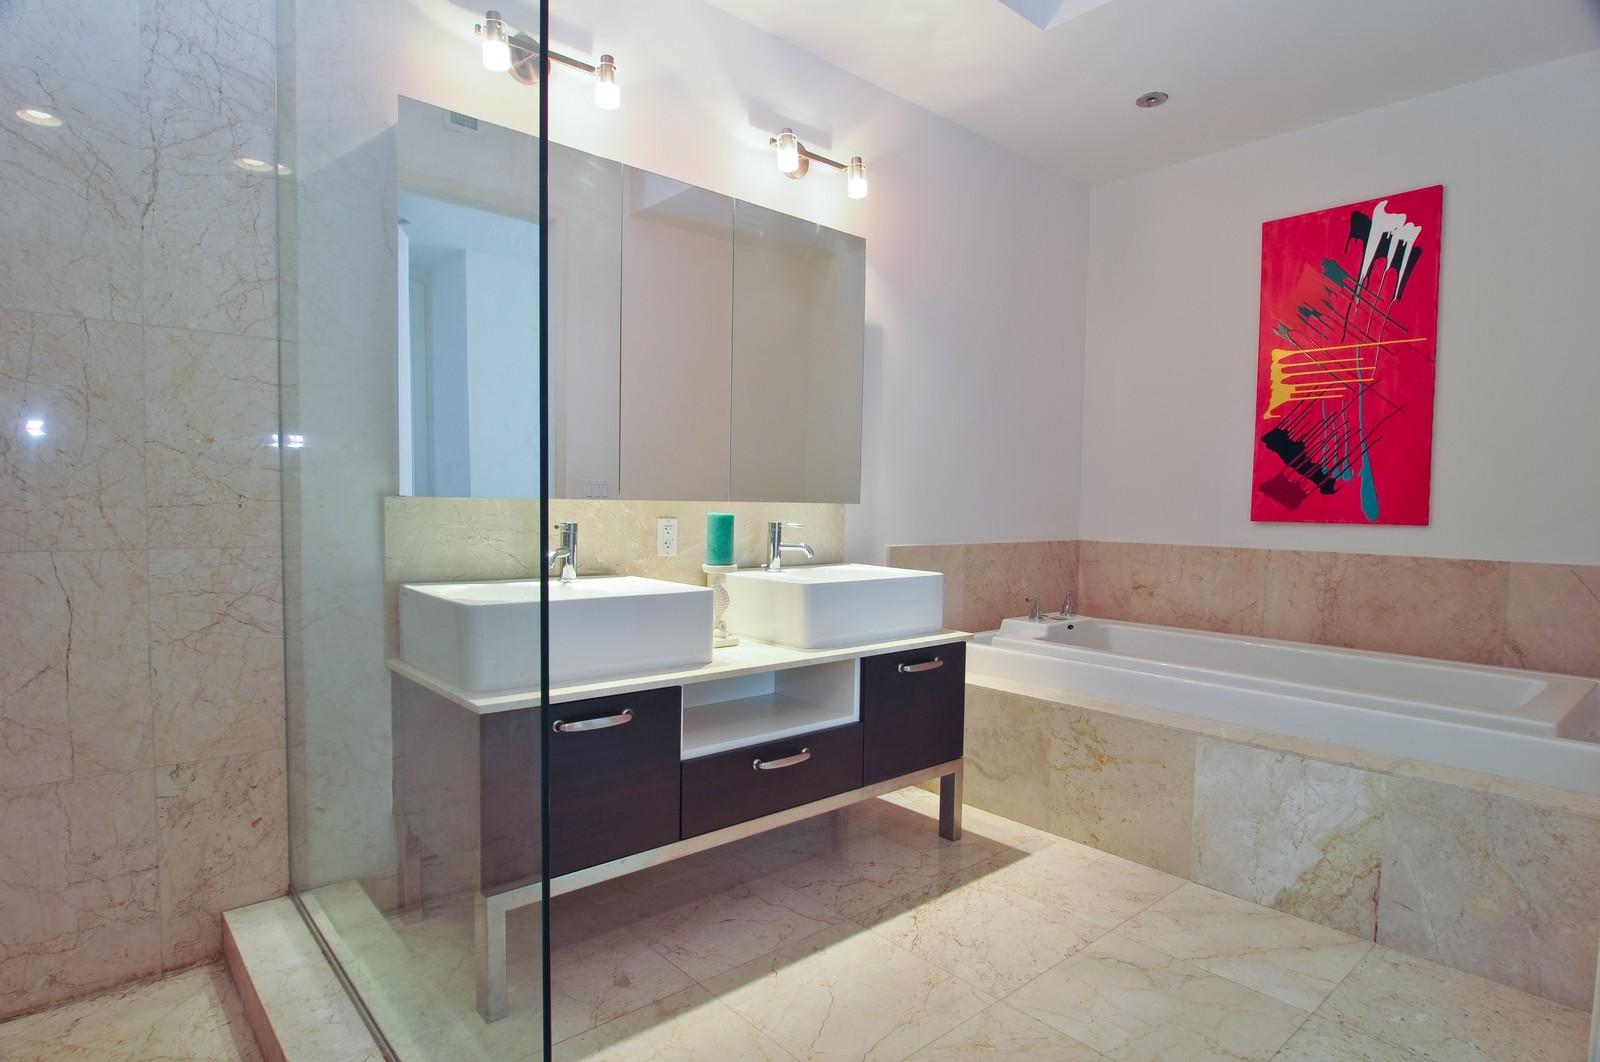 Real Estate Photography - 218 SE 14th St, PH 2, Miami, FL, 33131 - Master Bathroom